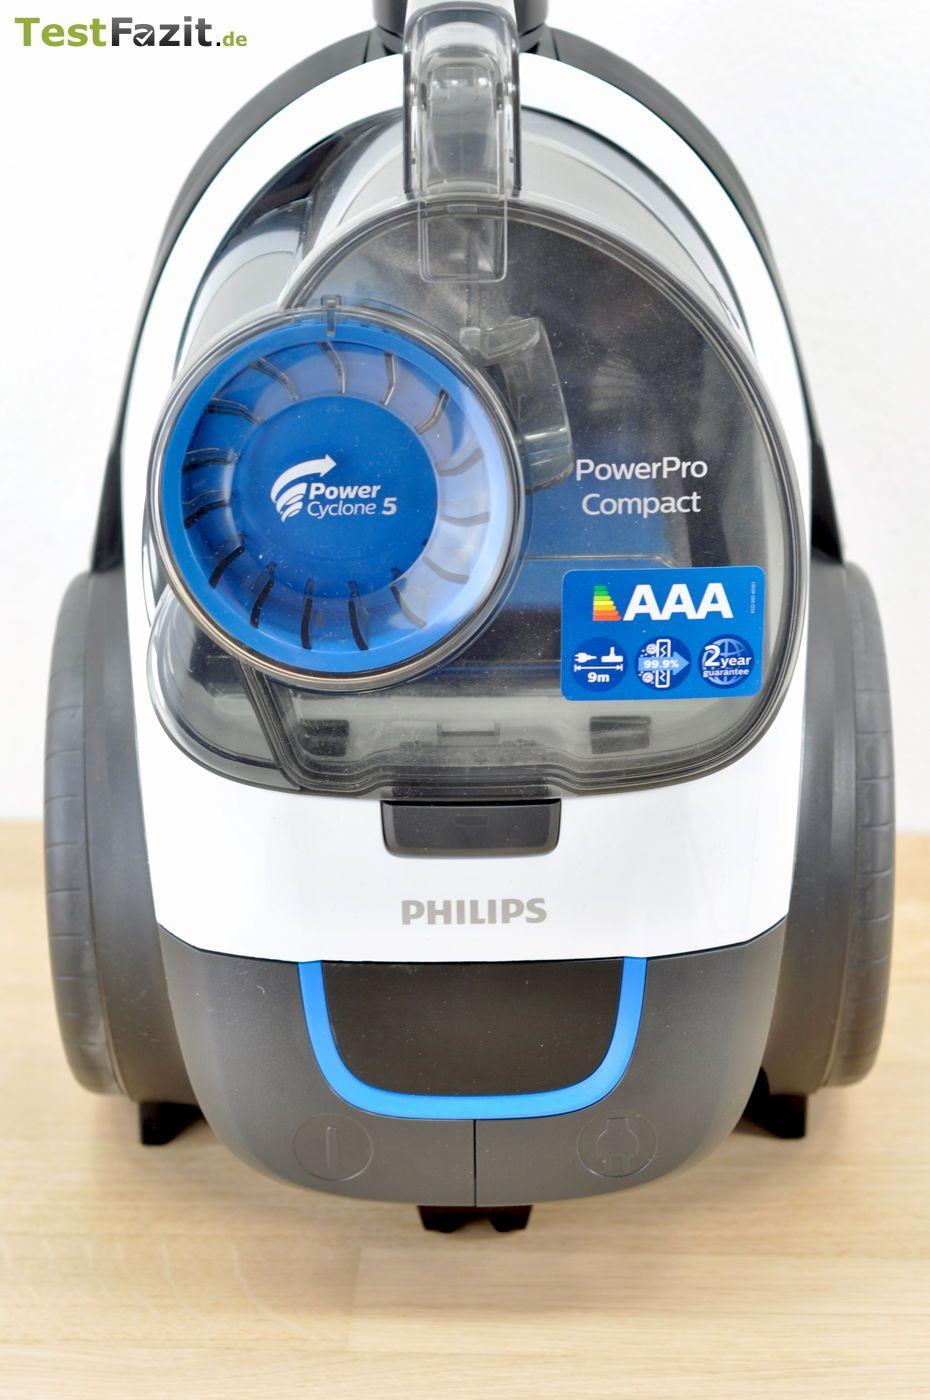 PowerPro Compact Beutelloser Staubsauger FC932009   Philips